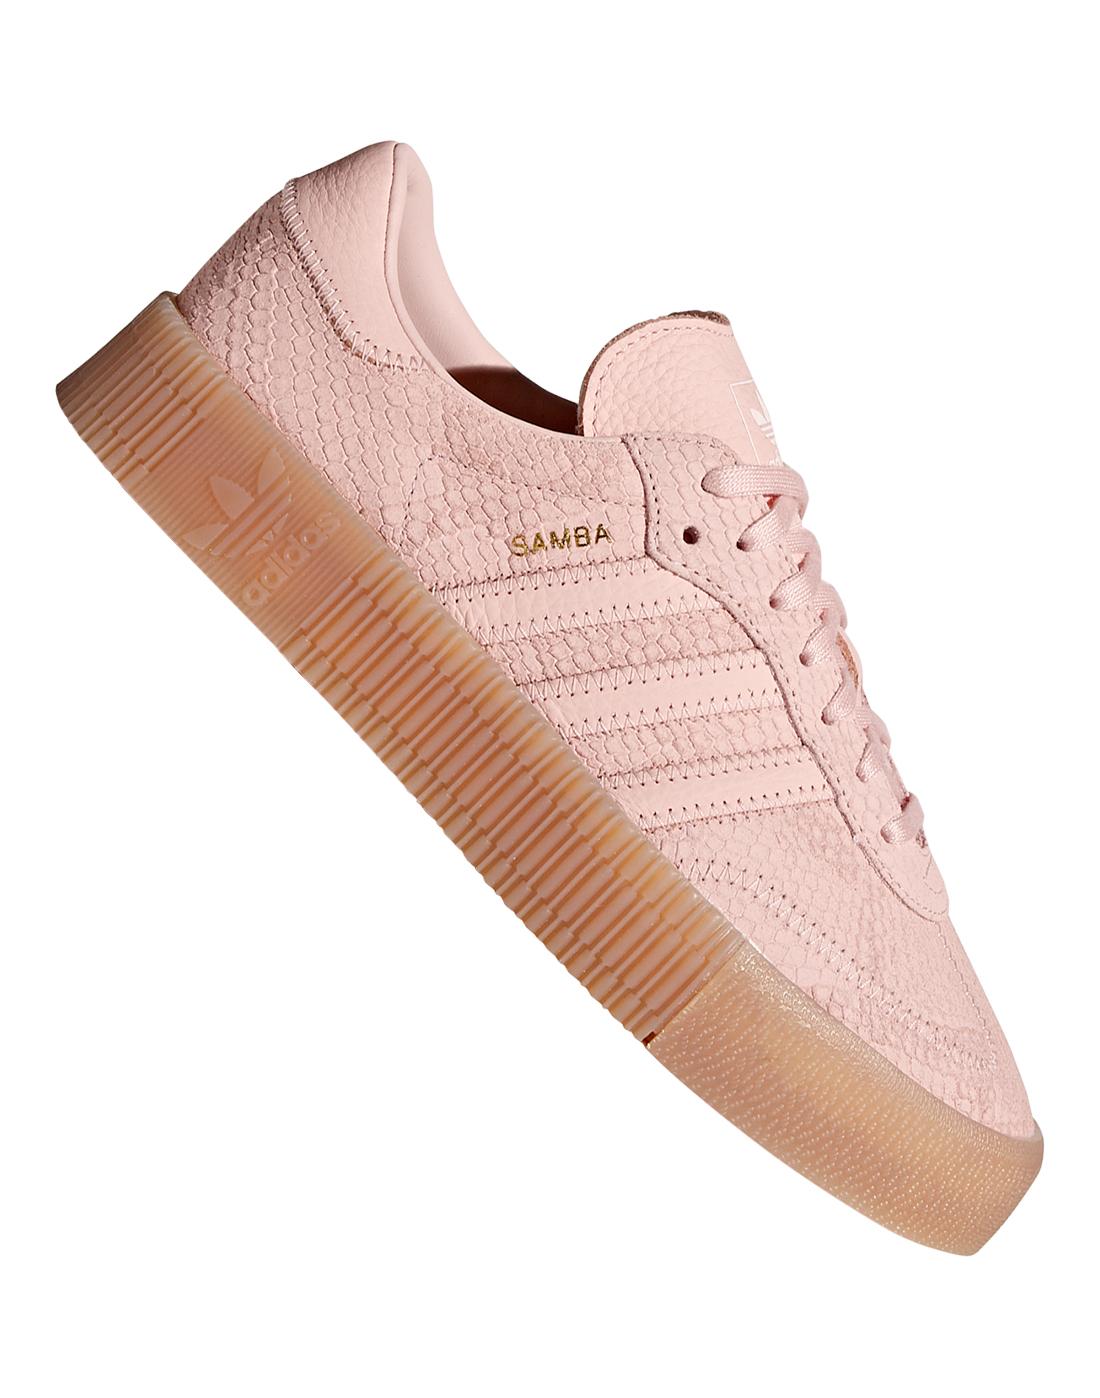 a845c82145f Women's adidas Originals Sambarose   Pink   Life Style Sports